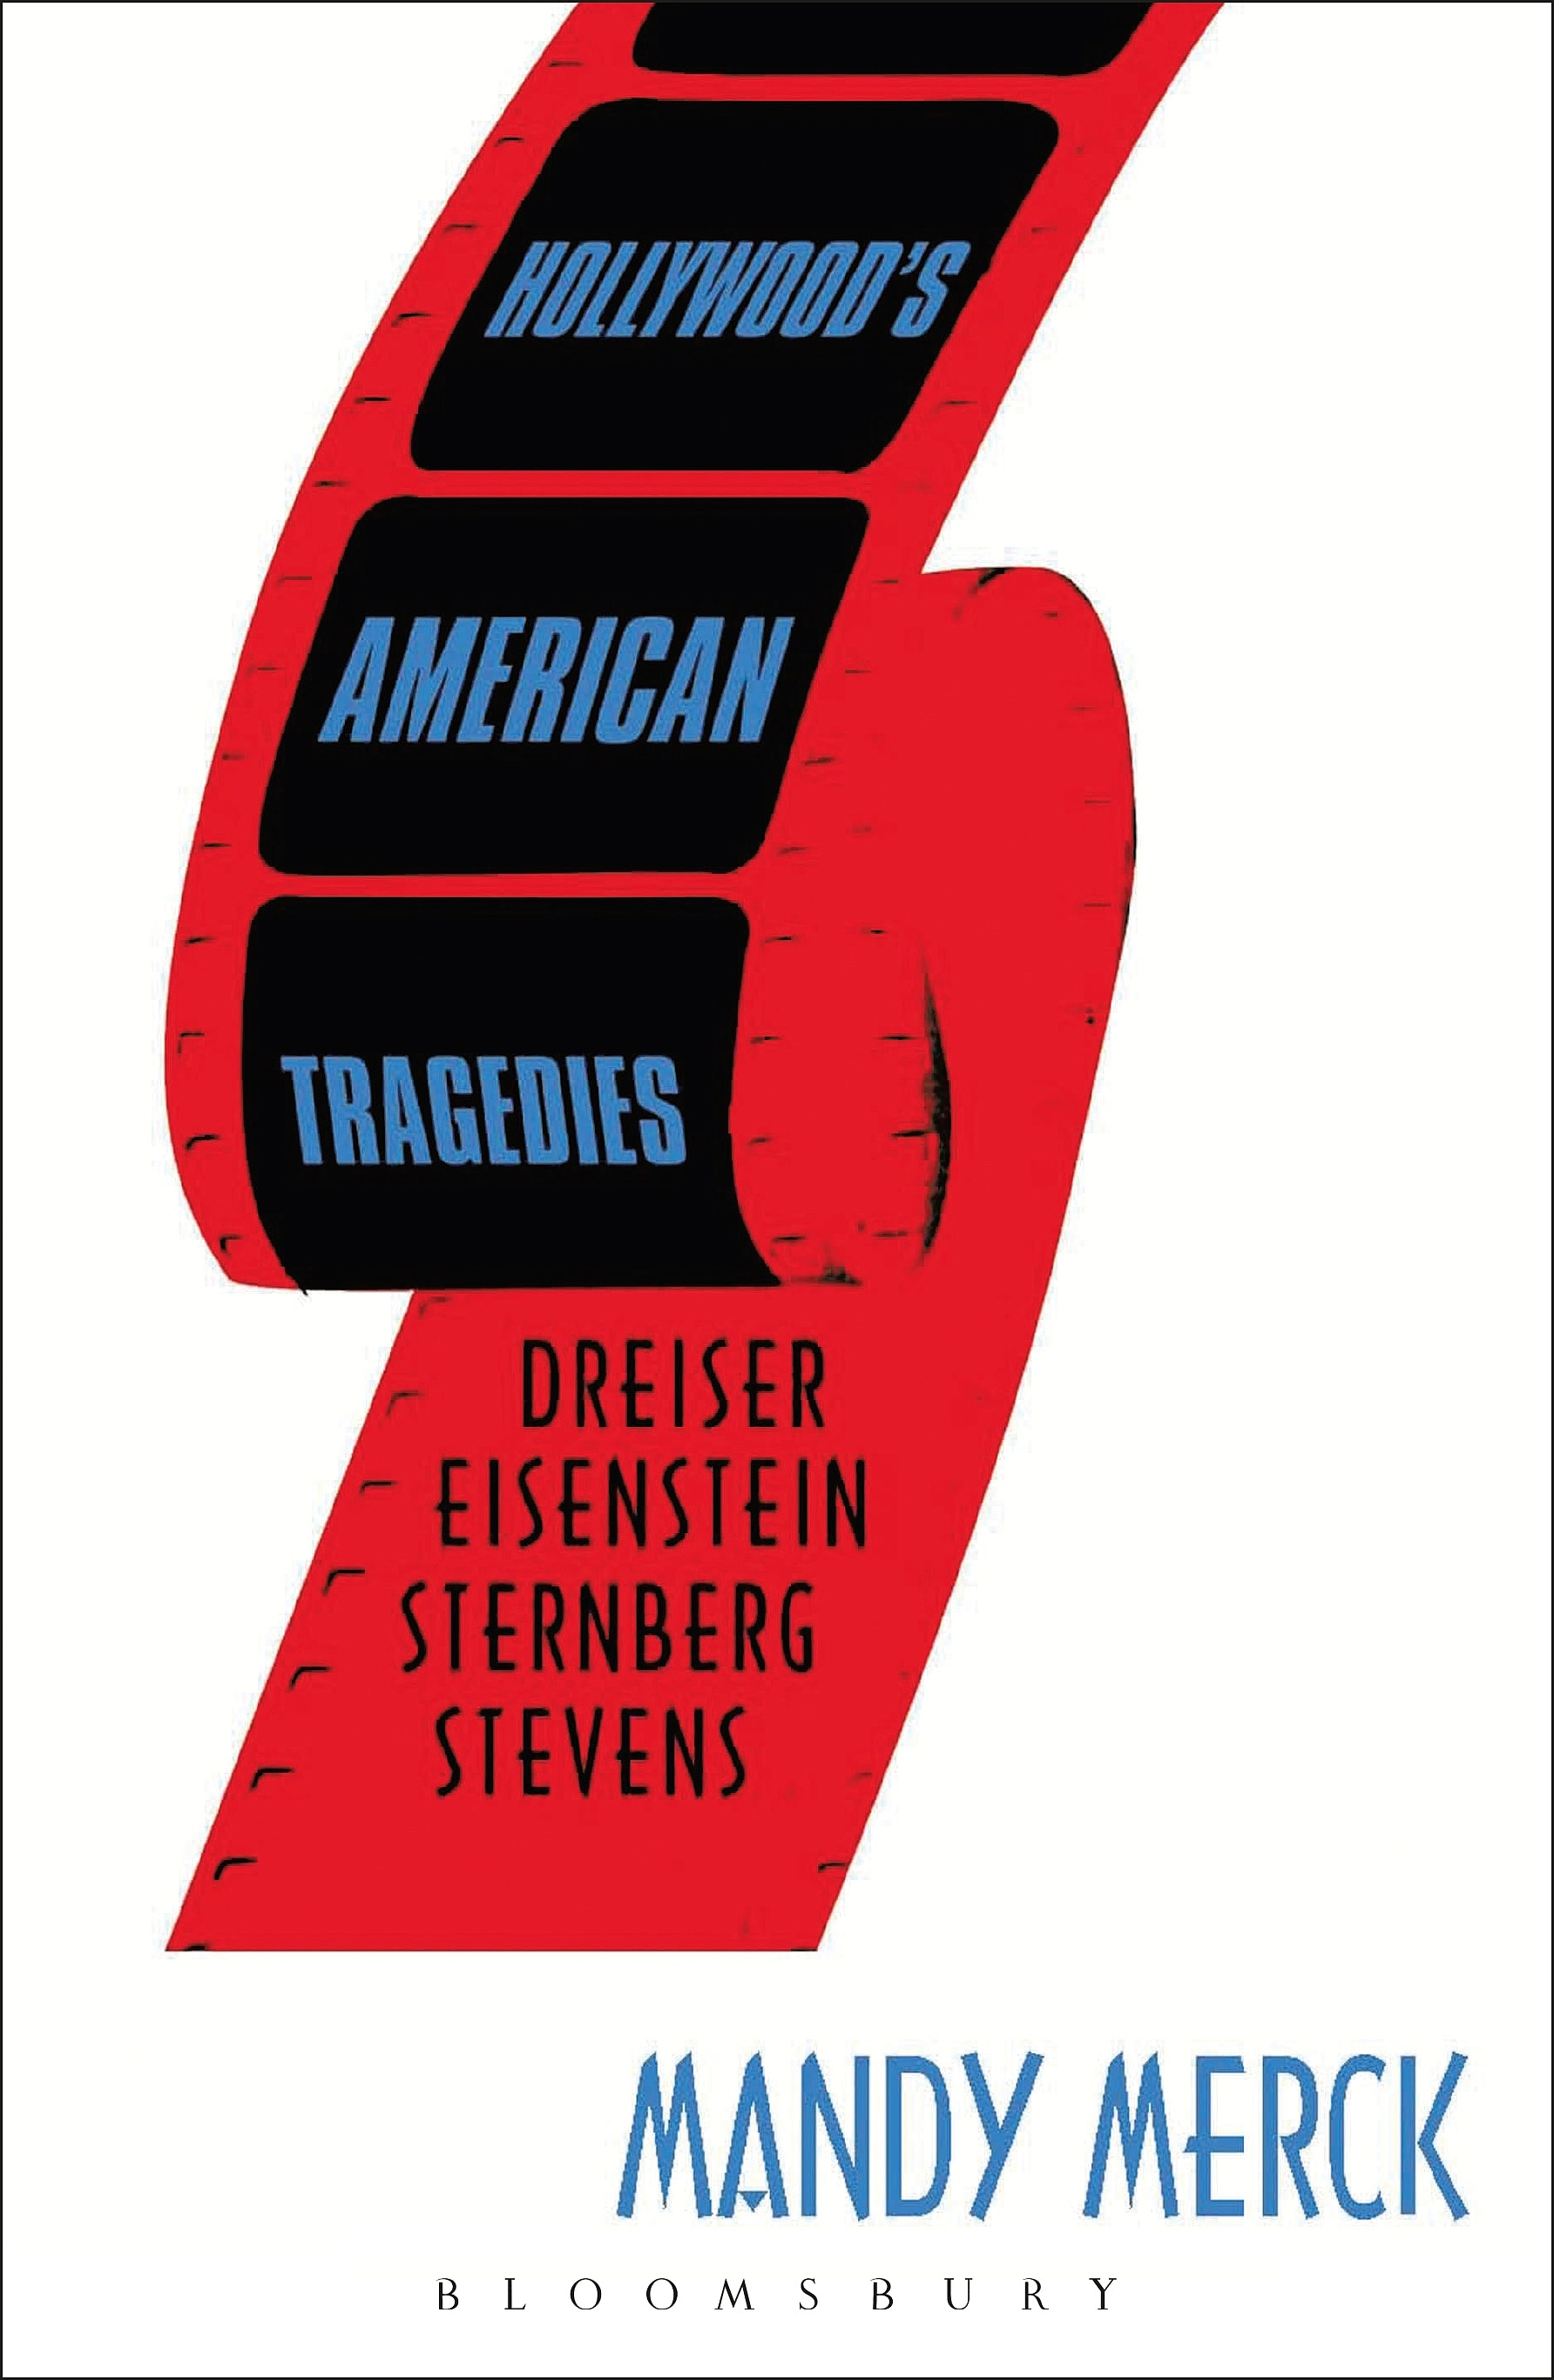 Hollywood's American Tragedies